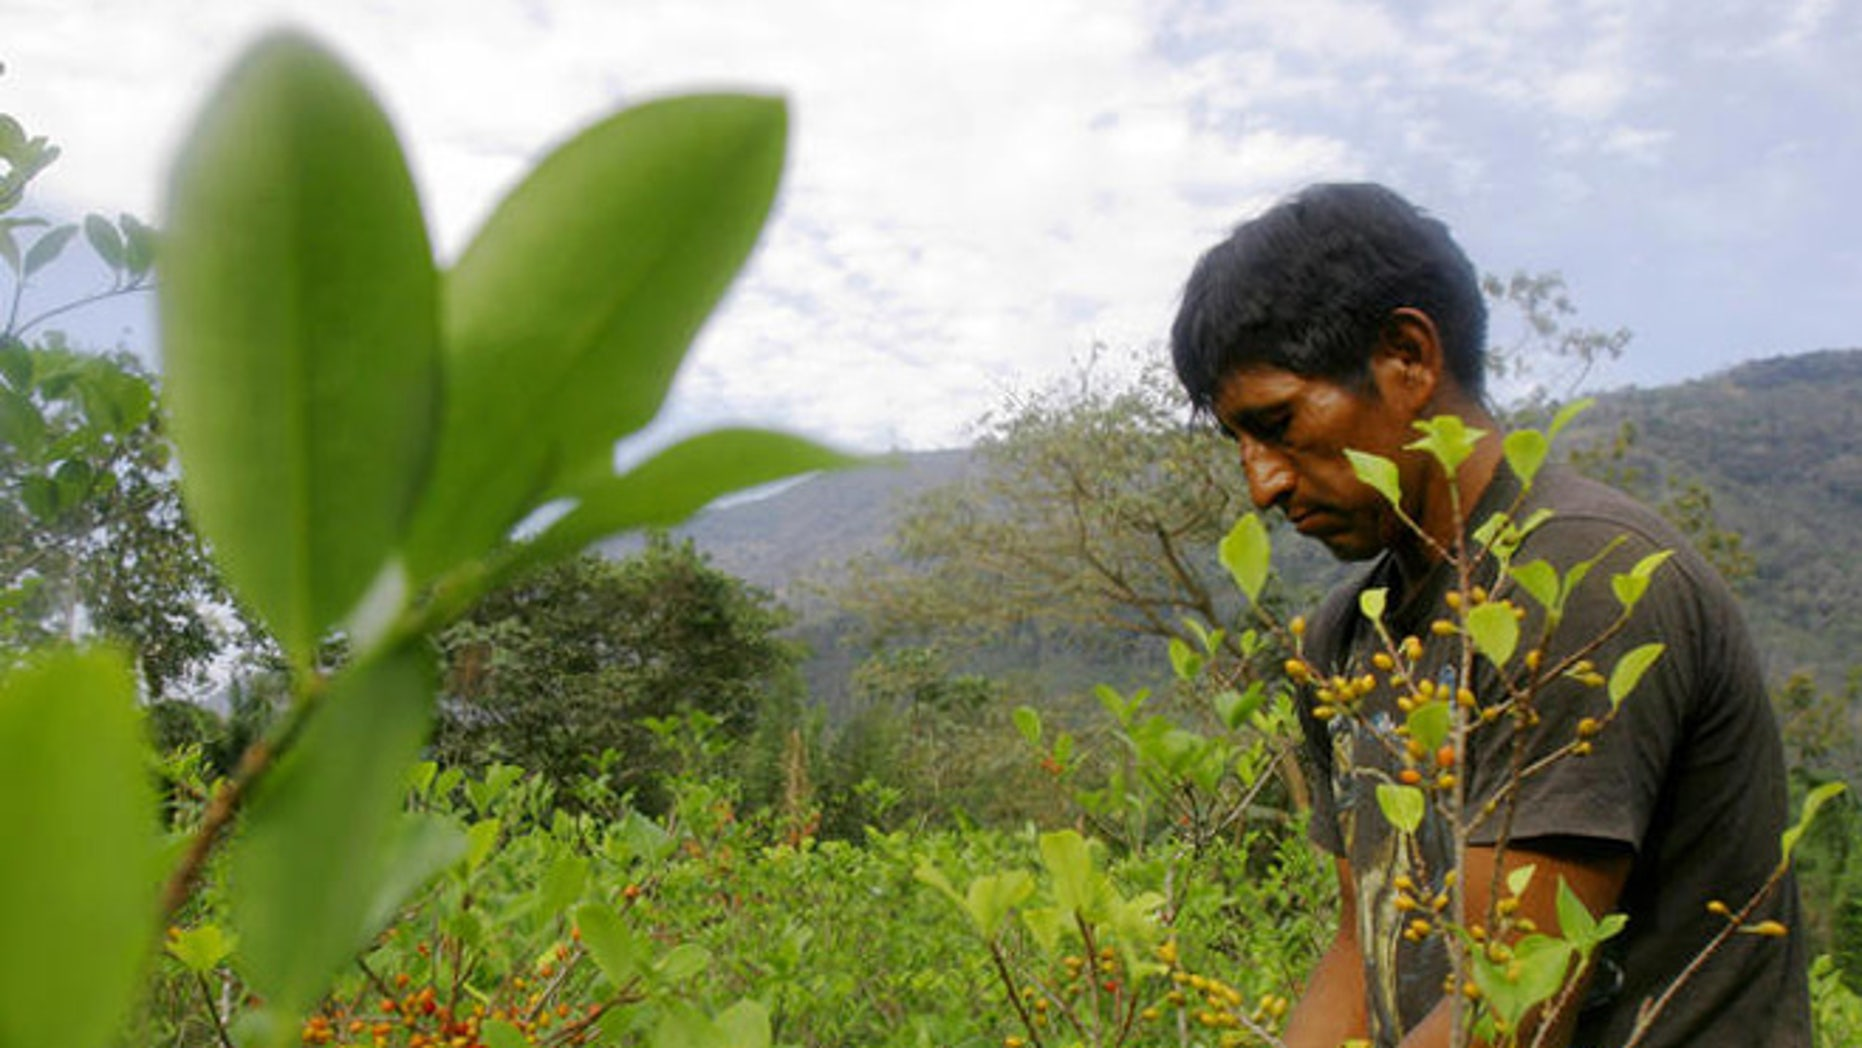 Freddy Pari, 40, picks coca seeds to sell on a street market in the village of La Asunta, some 200 km (124 miles) east of Bolivian capital La Paz. (AP Photo/Dado Galdieri)